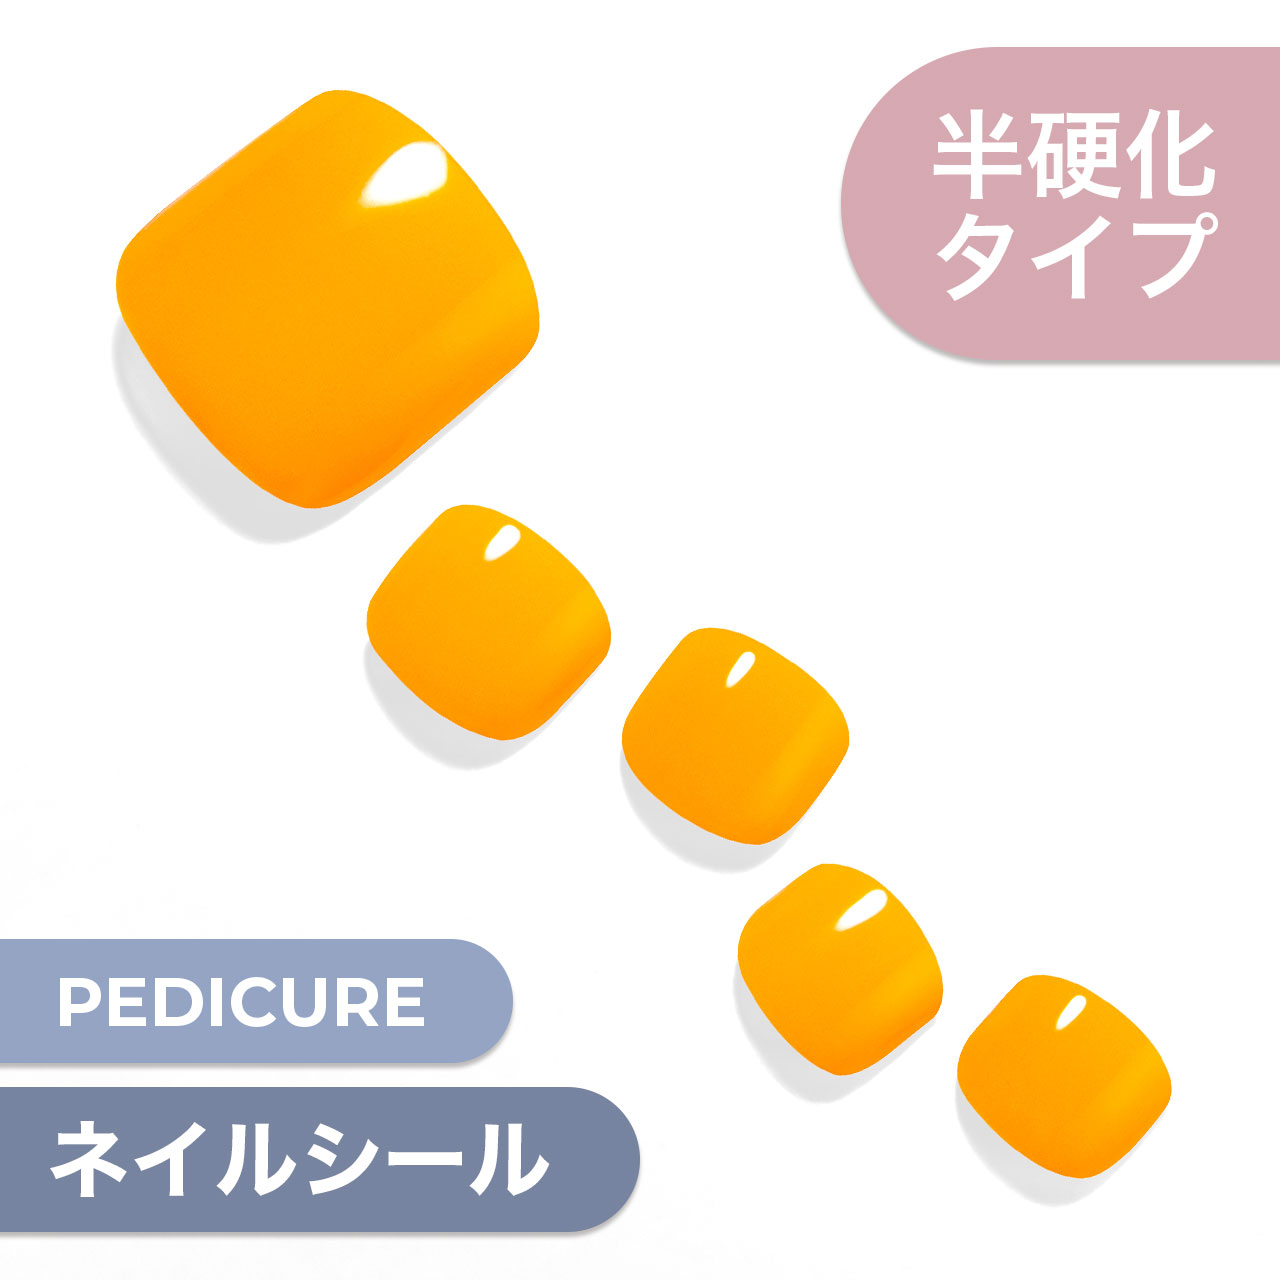 【Juicy Mandarin Pedi】ダッシングディバグレーズ ペディ